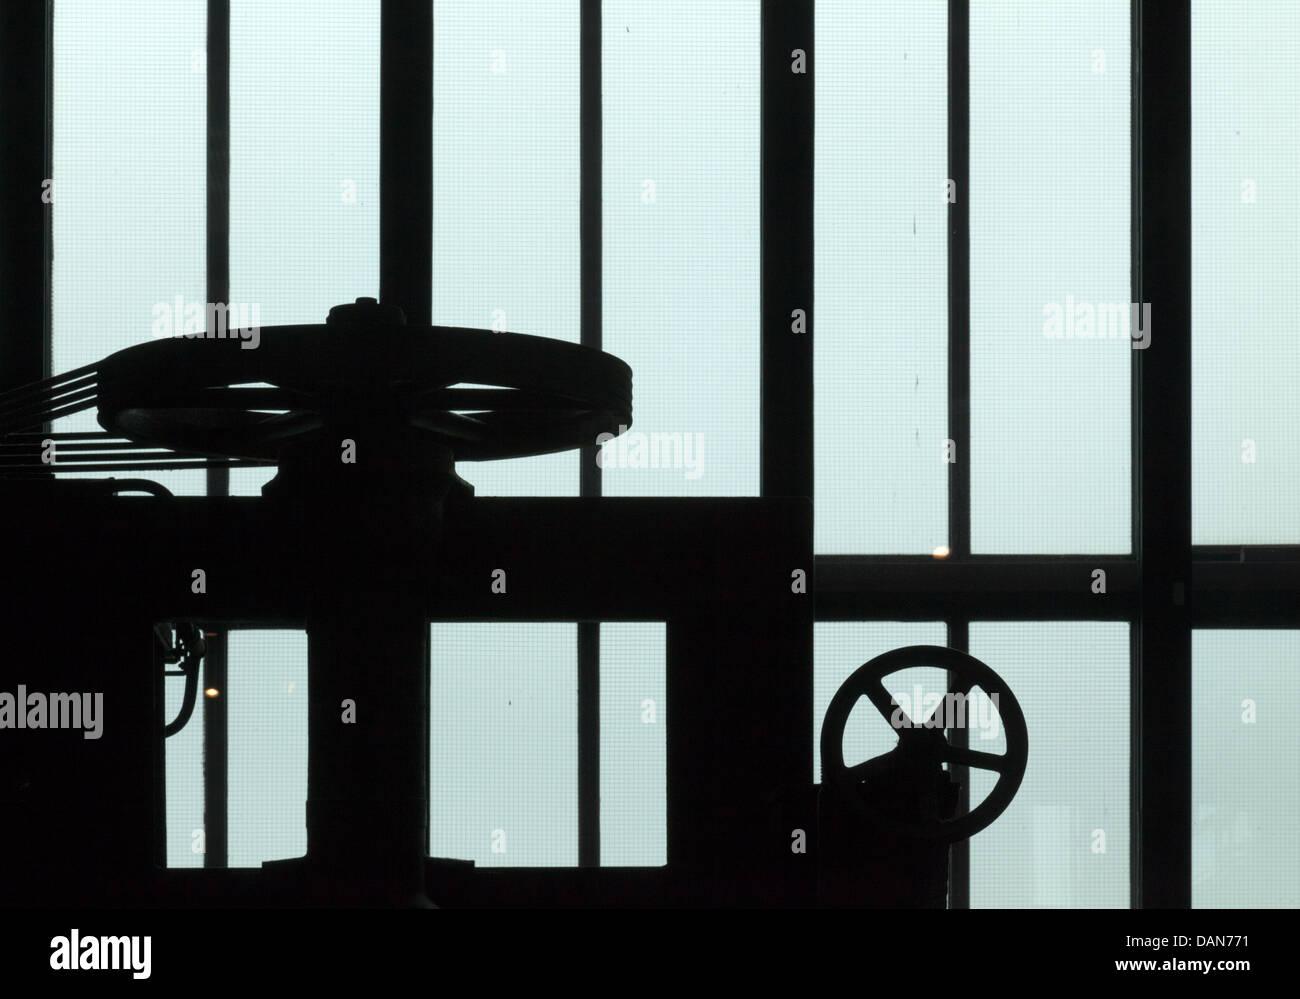 Groß Drahtglasfenster Galerie - Elektrische Schaltplan-Ideen ...